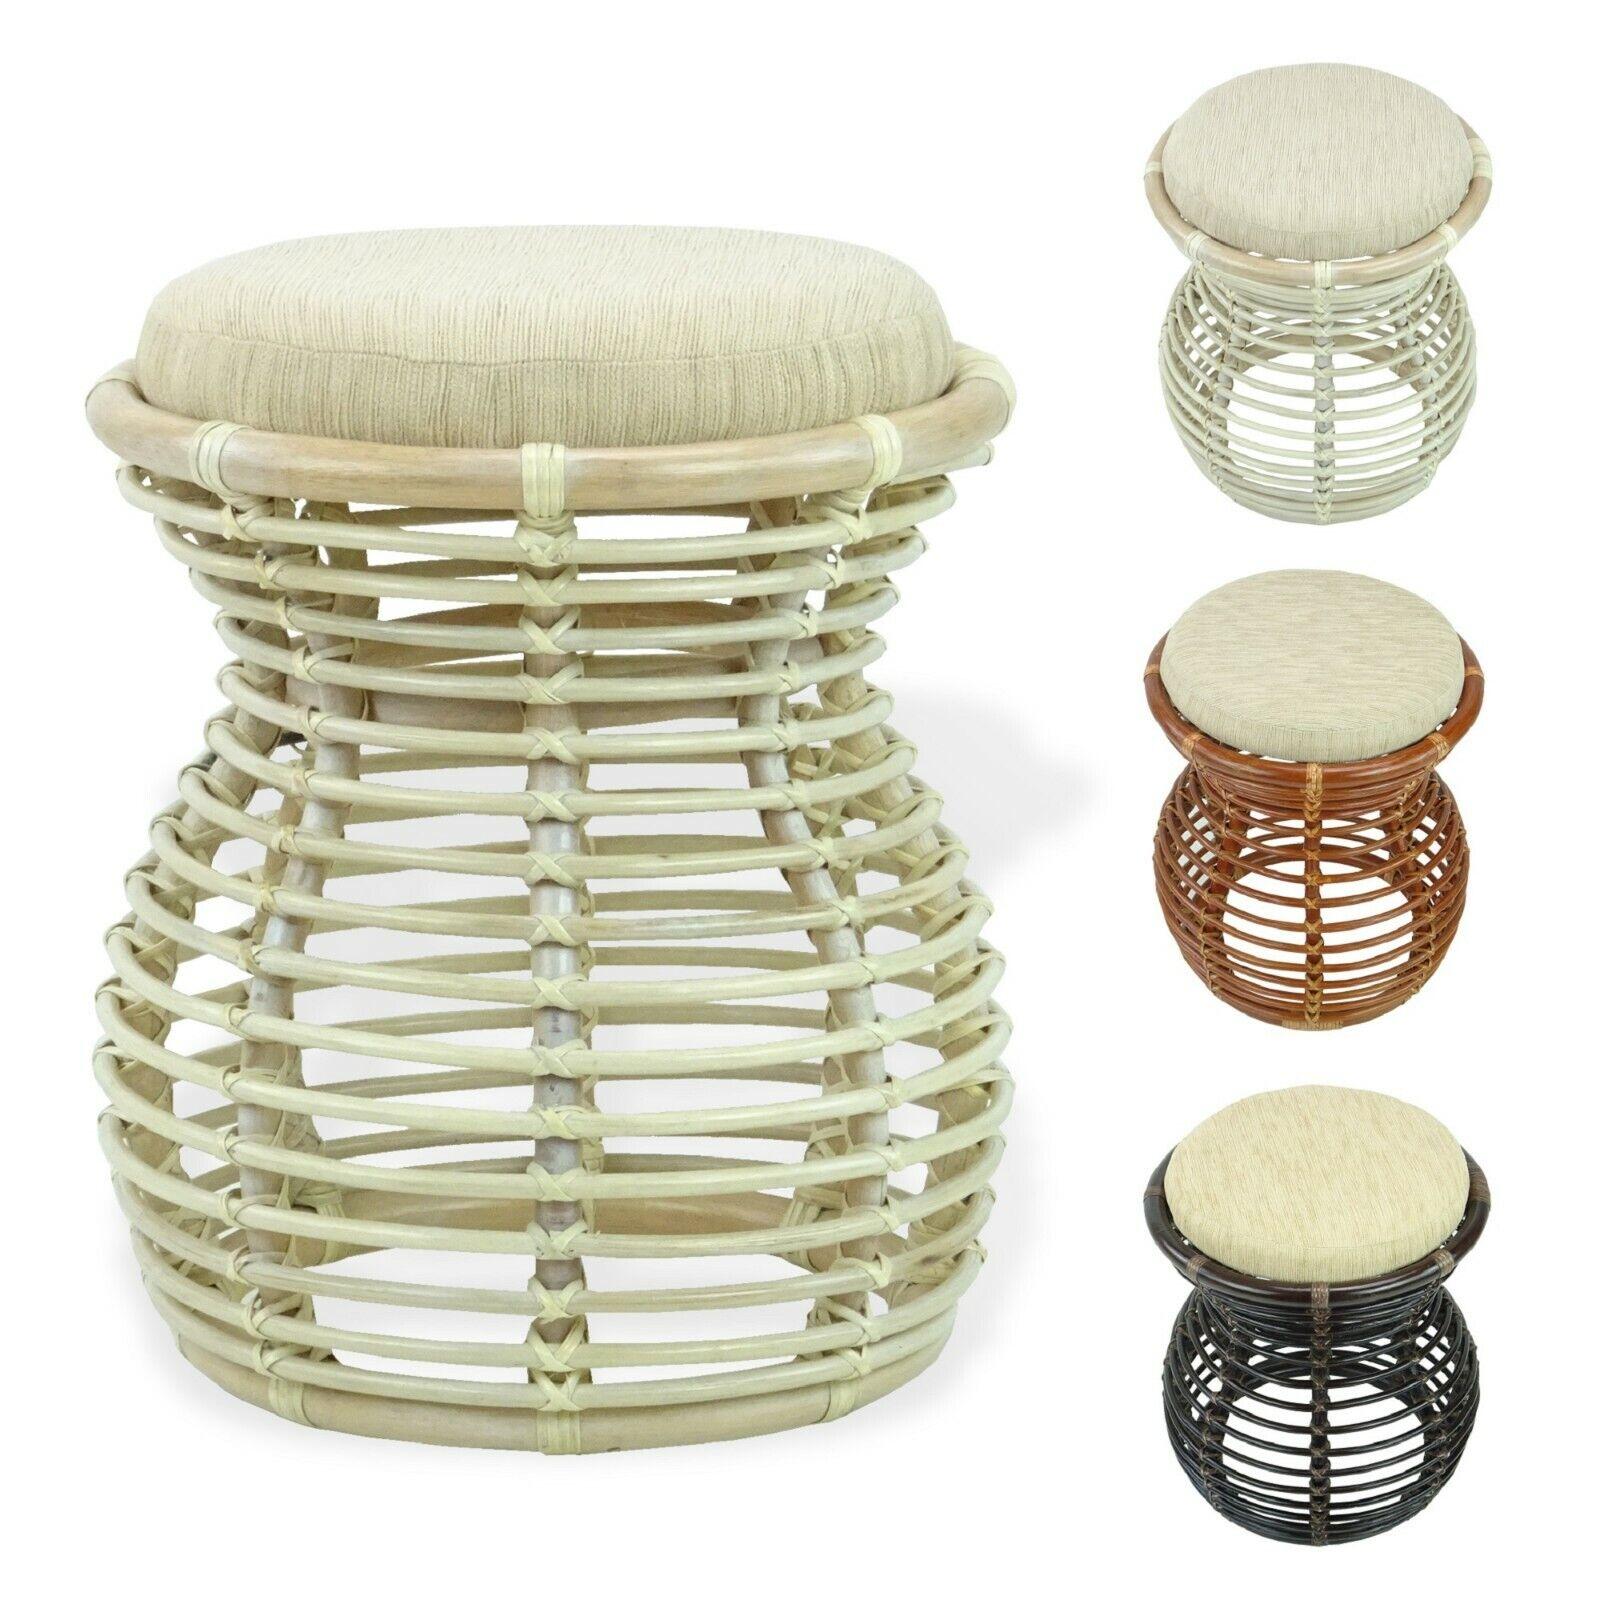 natural rattan wicker milan ottoman stool vanity